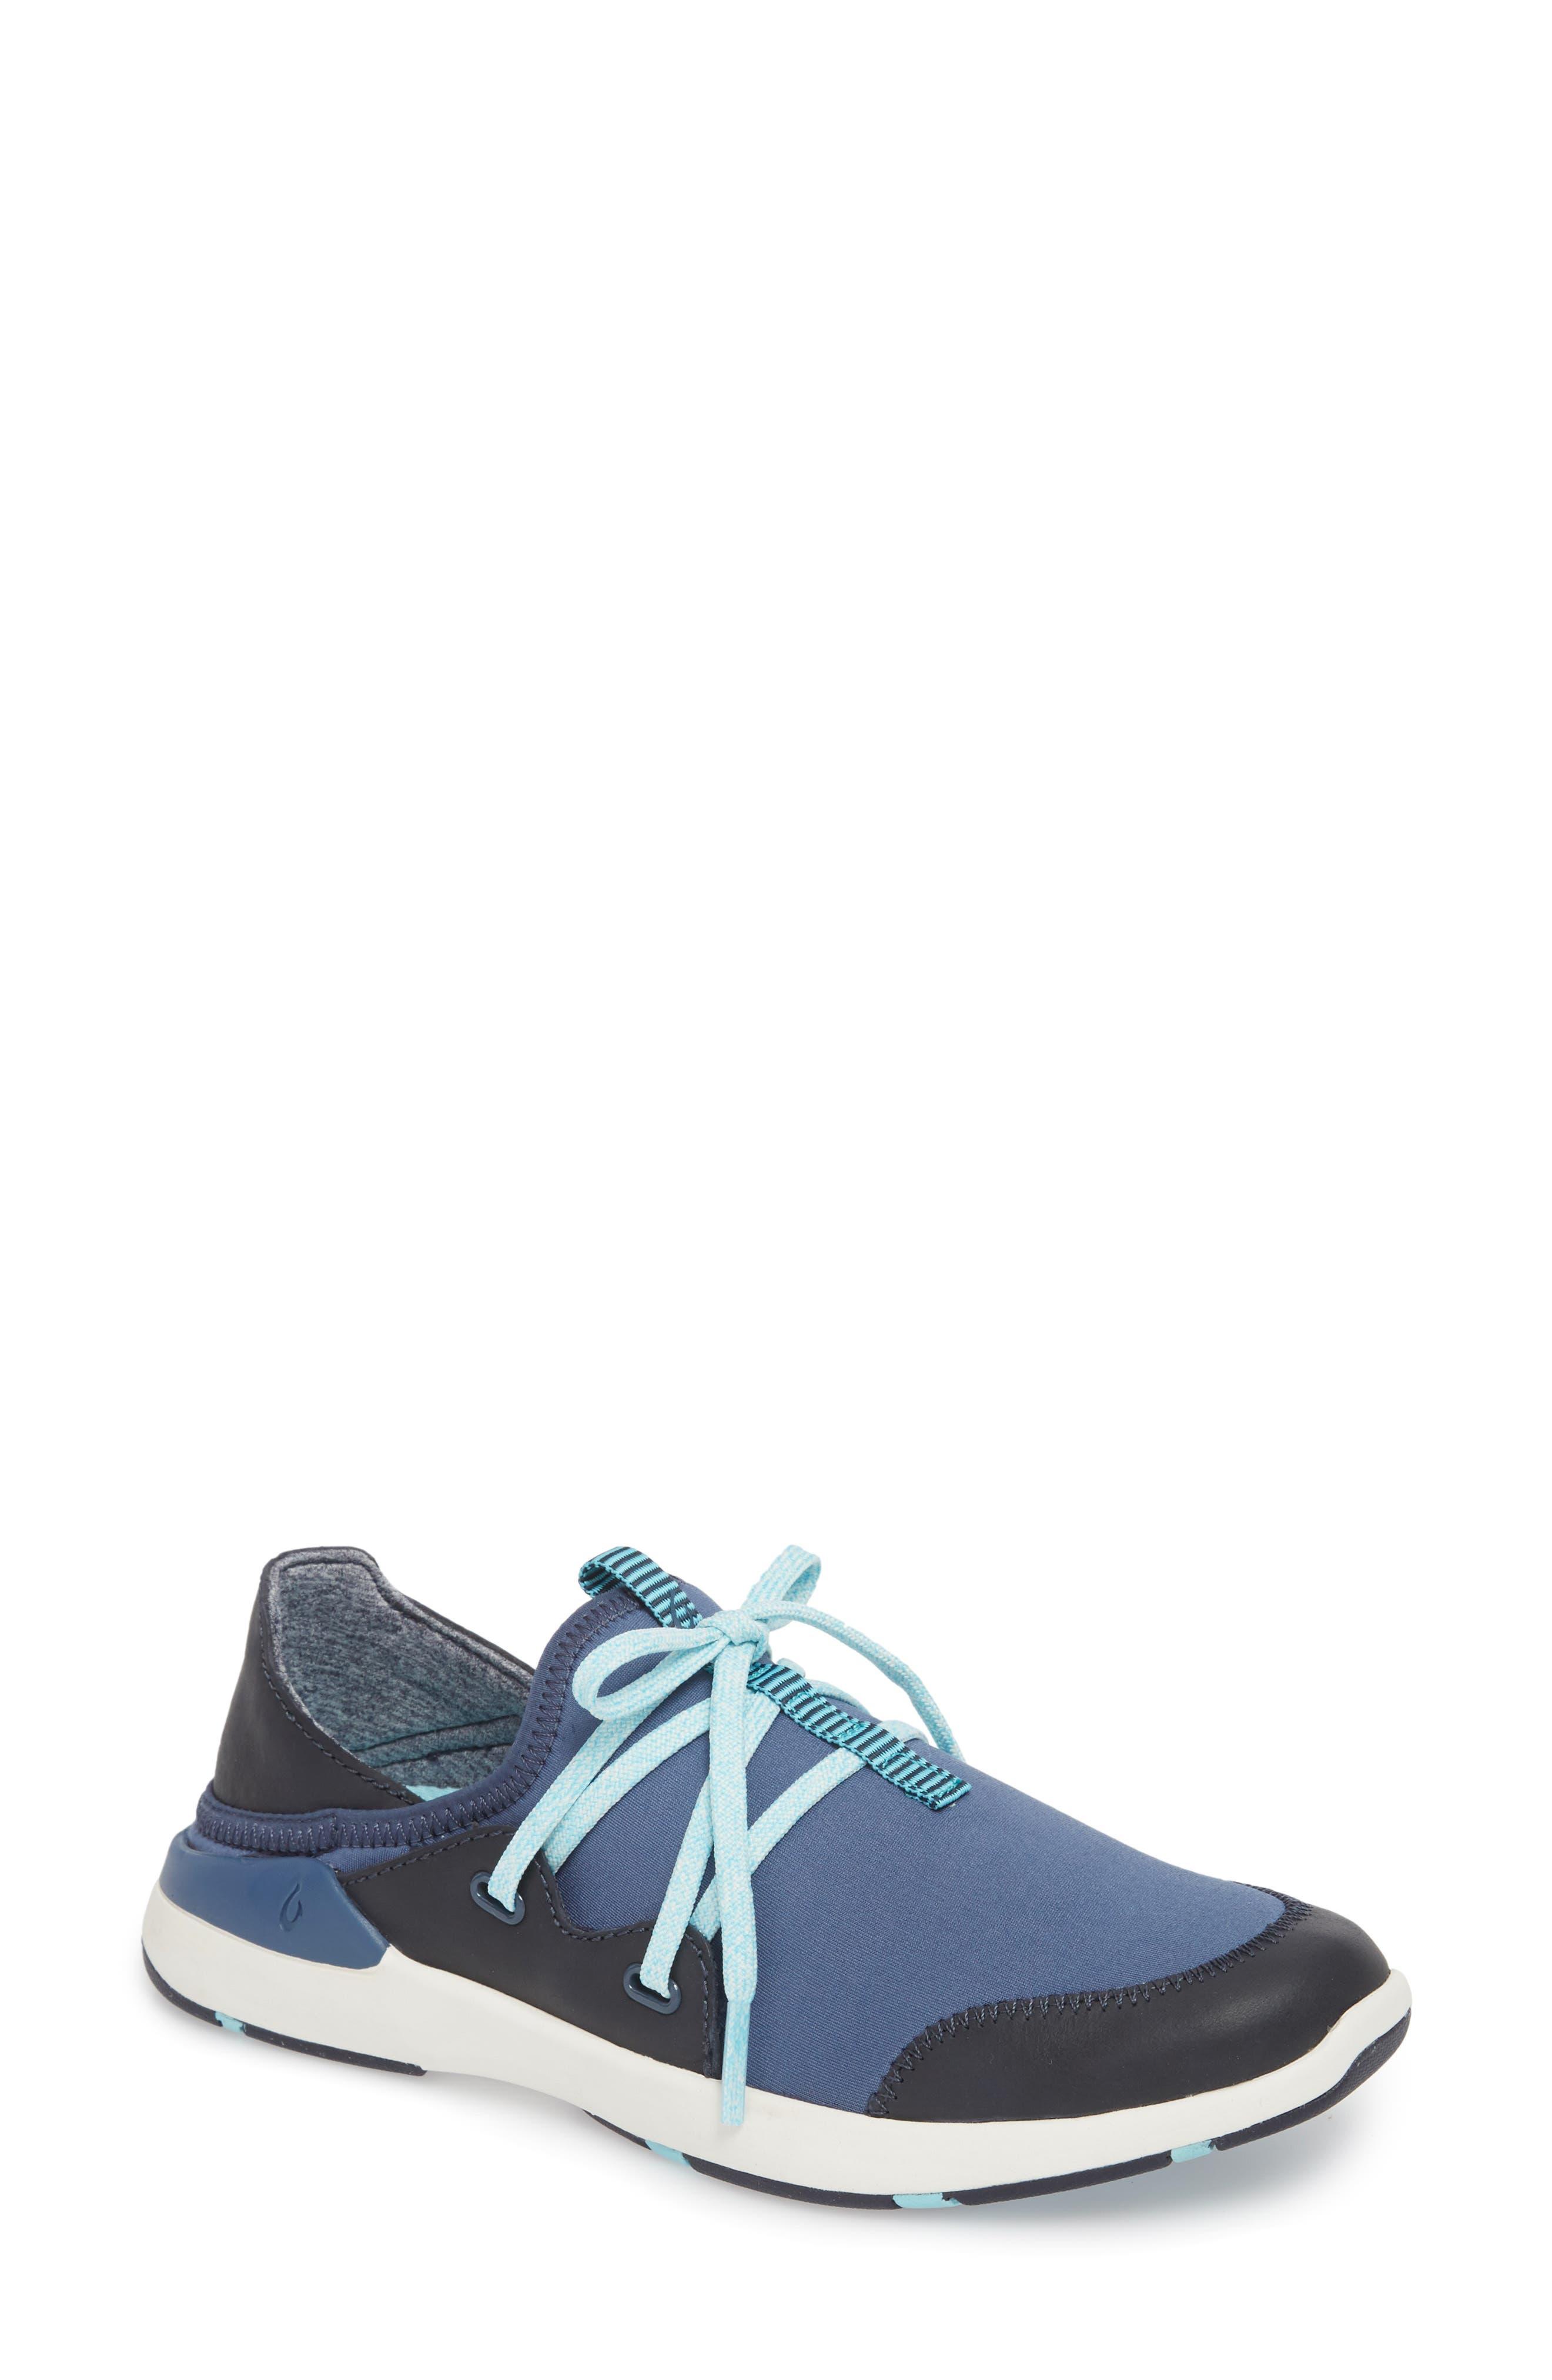 Olukai Miki Li Convertible Sneaker- Blue